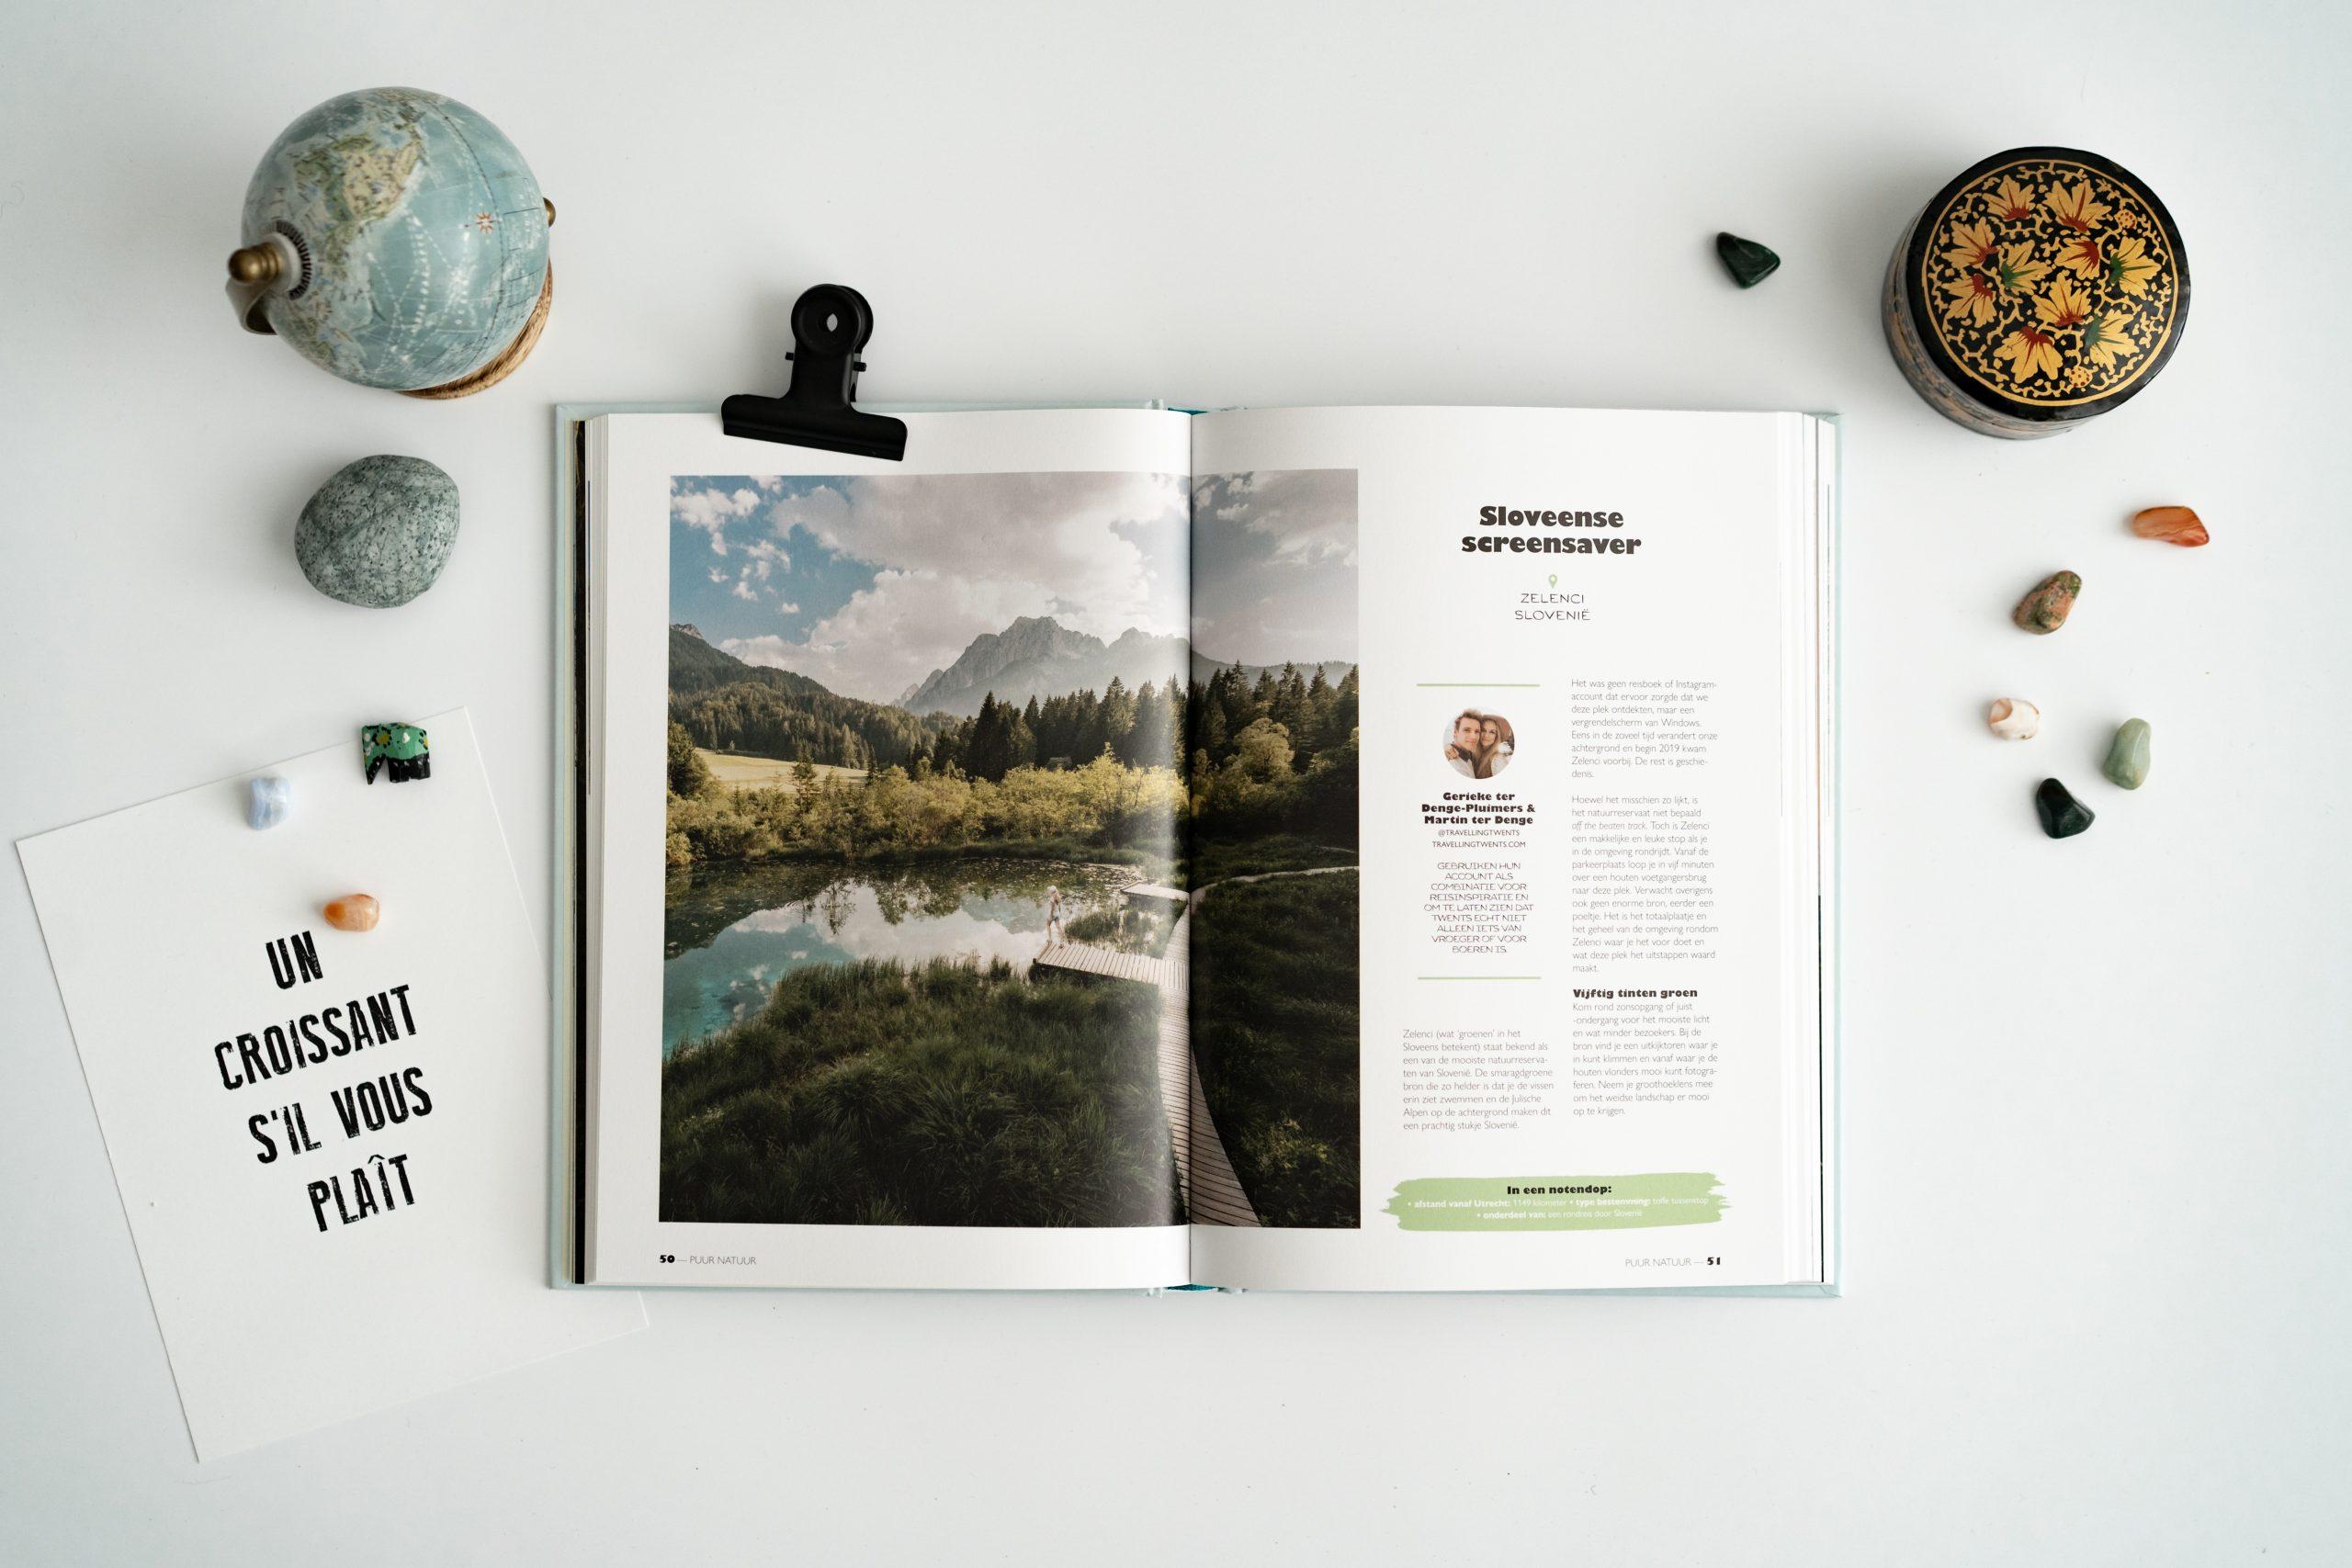 Insta Travel: 75 buitengewone bestemmingen in Europa